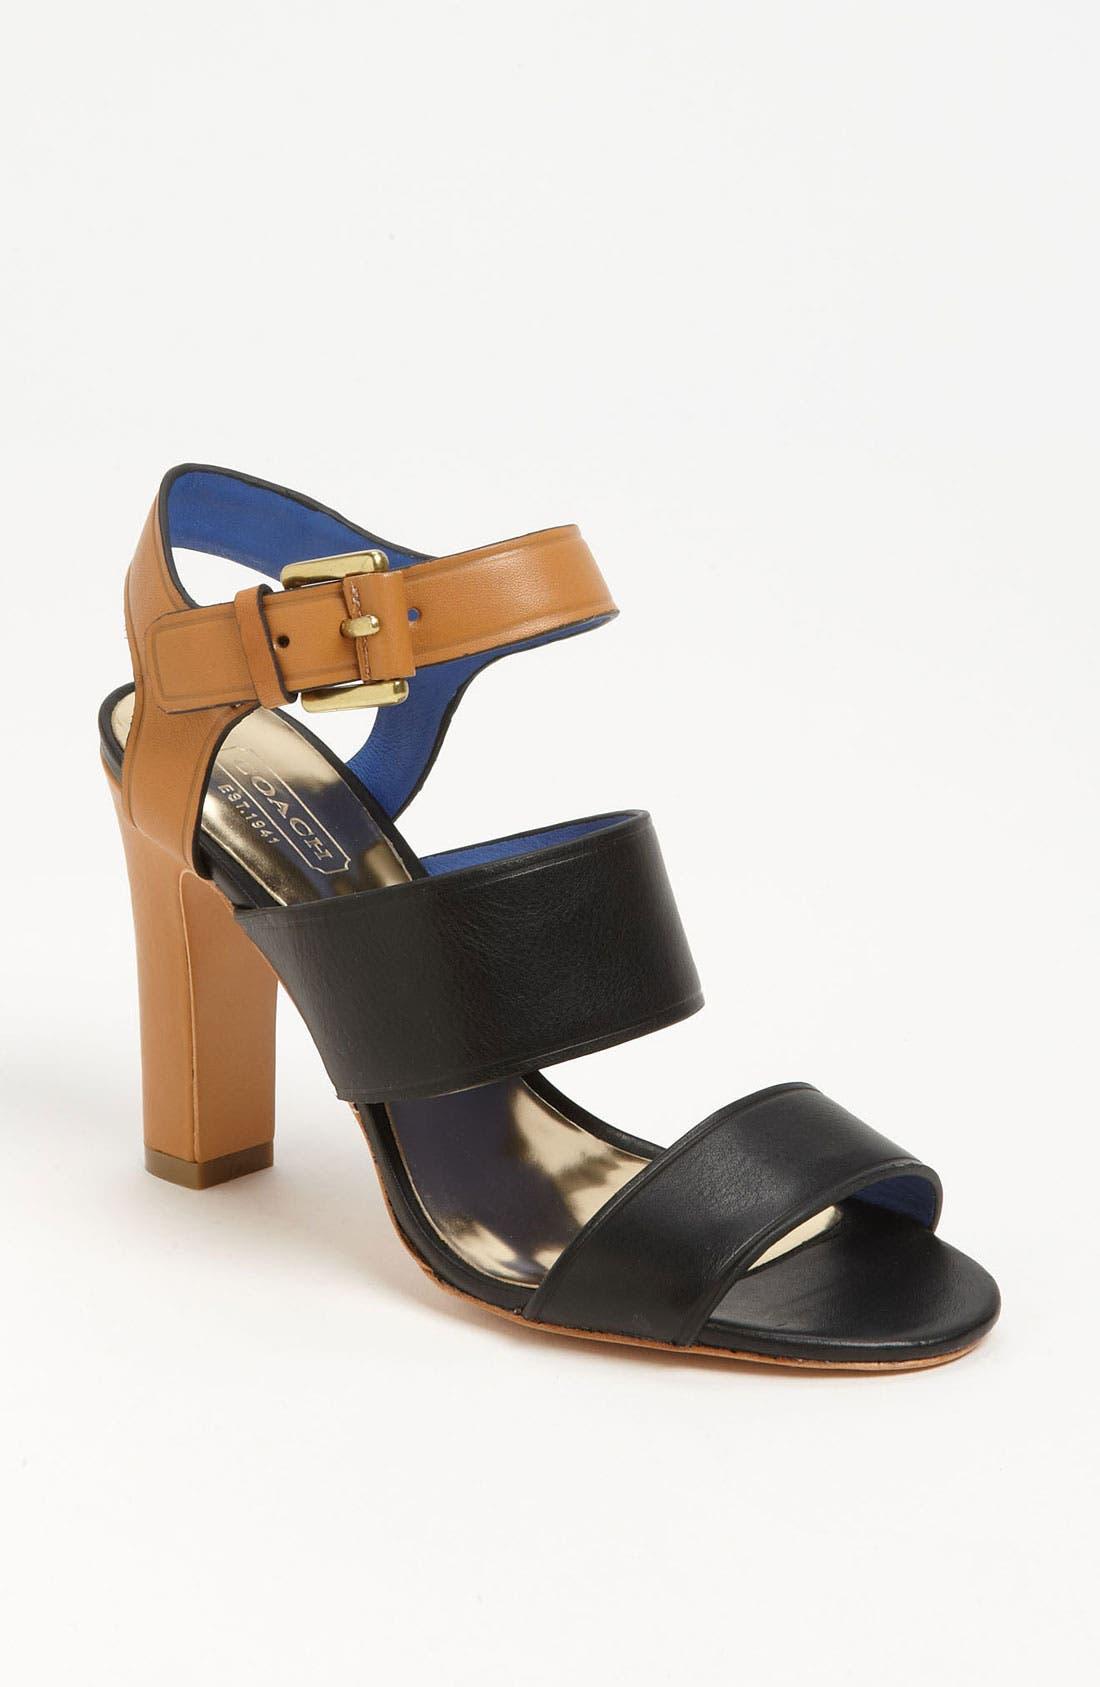 Main Image - COACH 'Tilly' Sandal